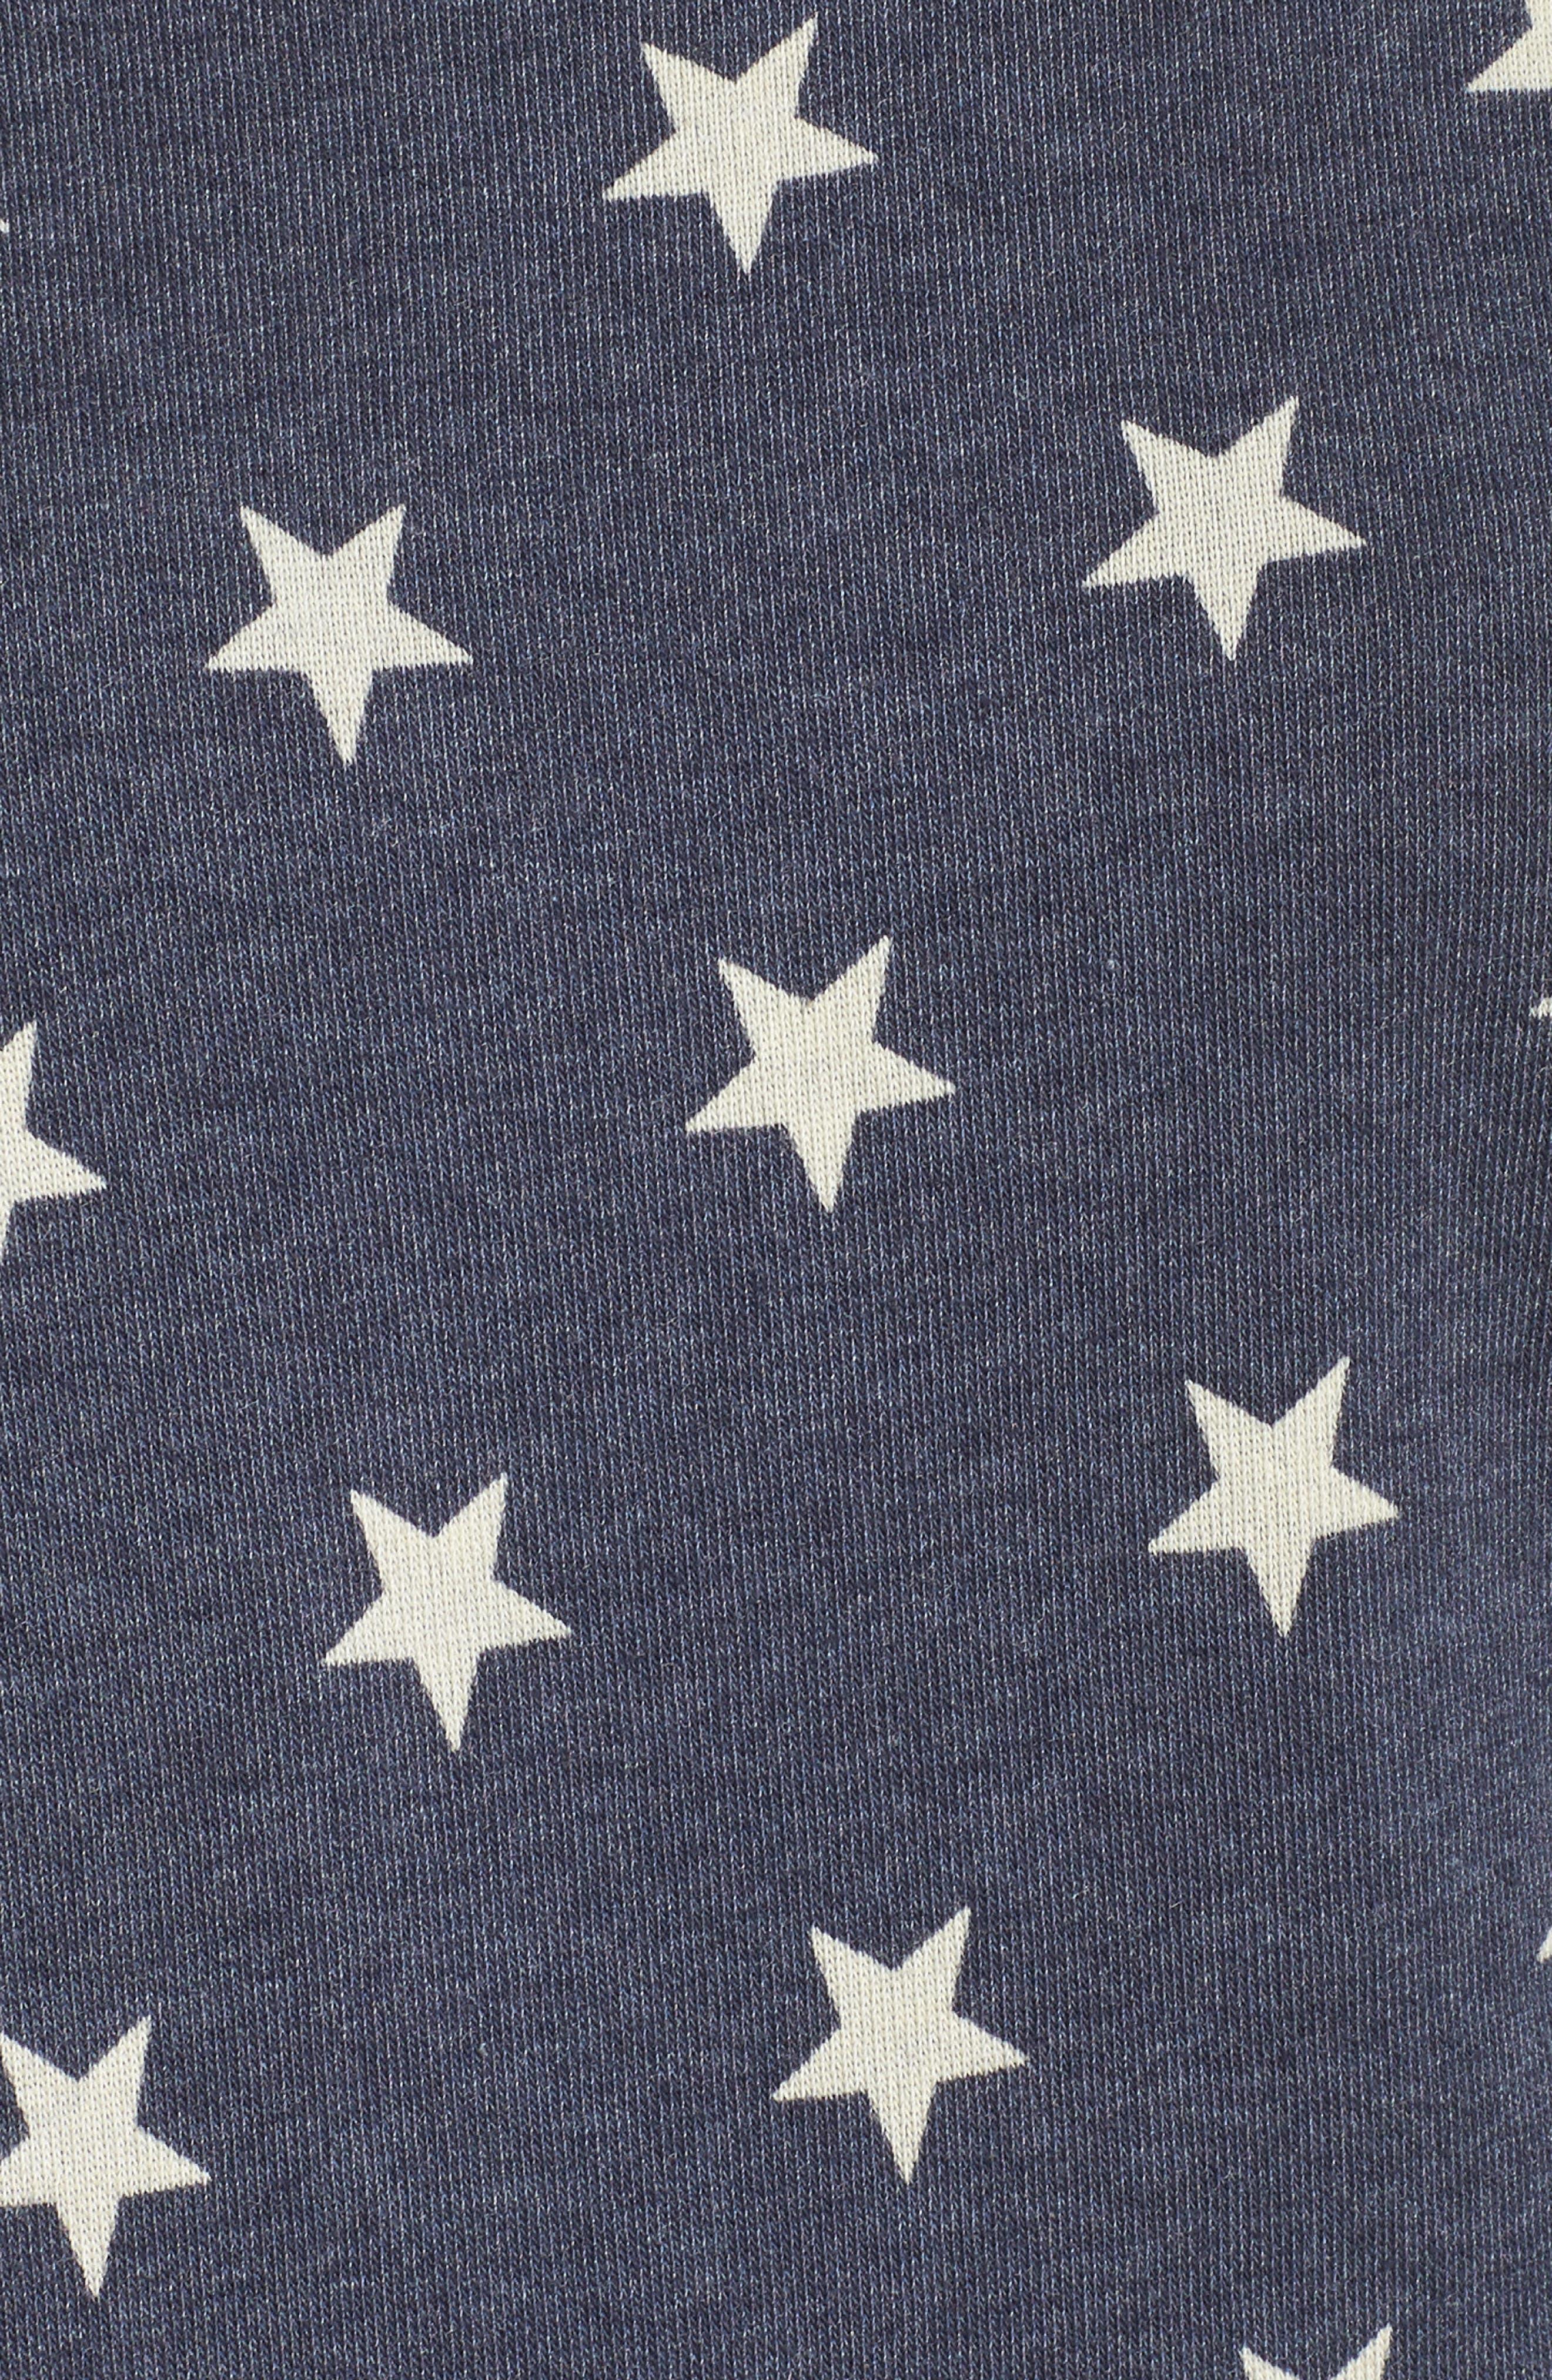 Maniac Camo Fleece Sweatshirt,                             Alternate thumbnail 5, color,                             Stars